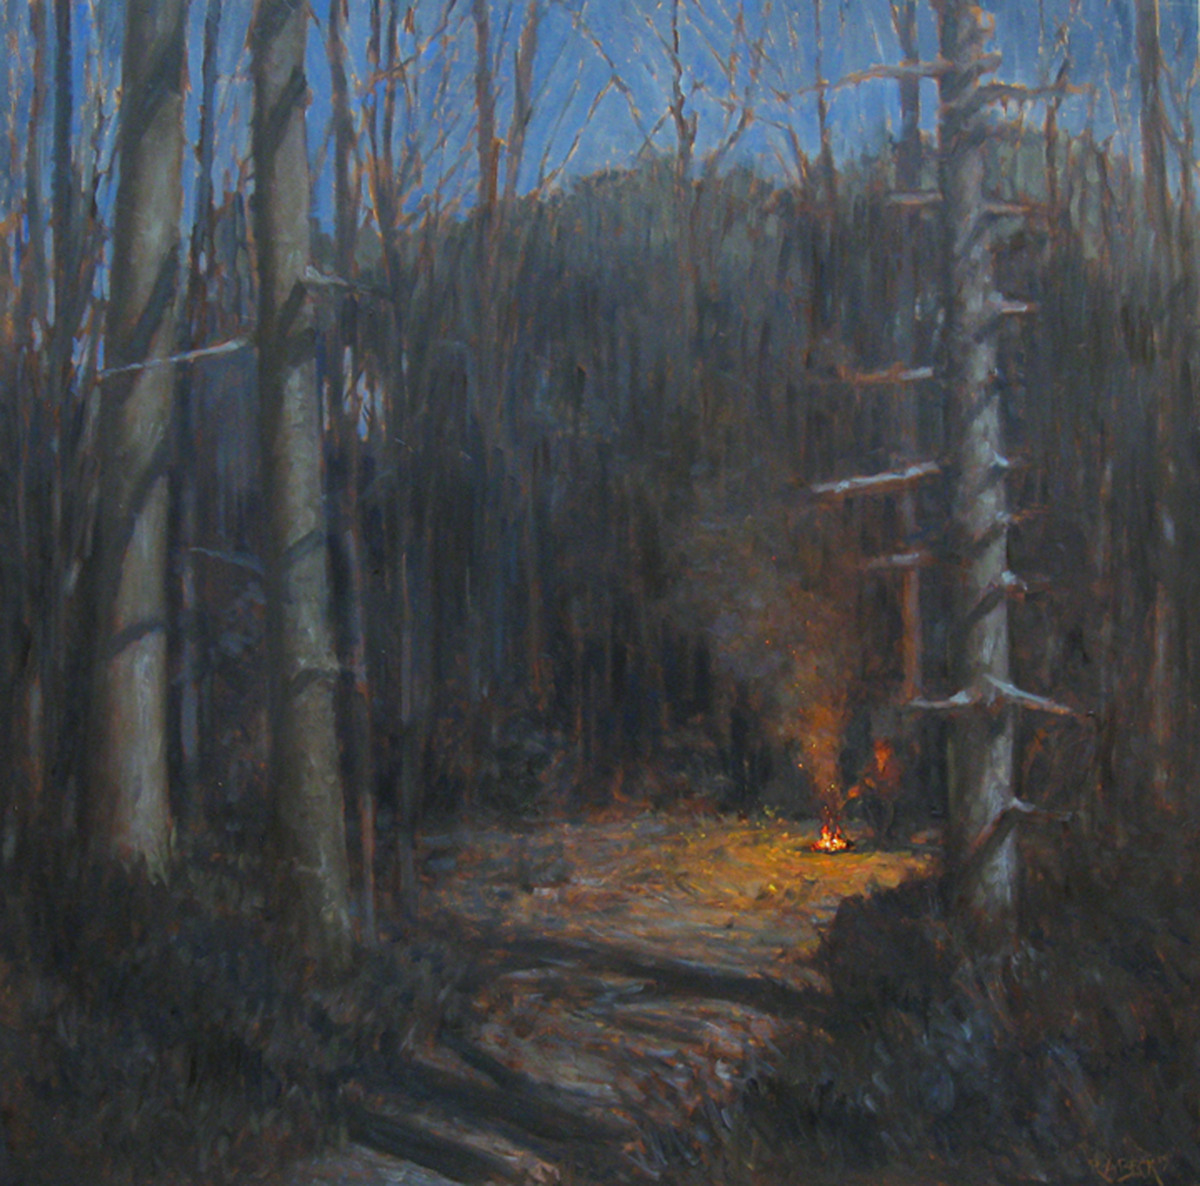 Dusk (Robert Beck) (large view)